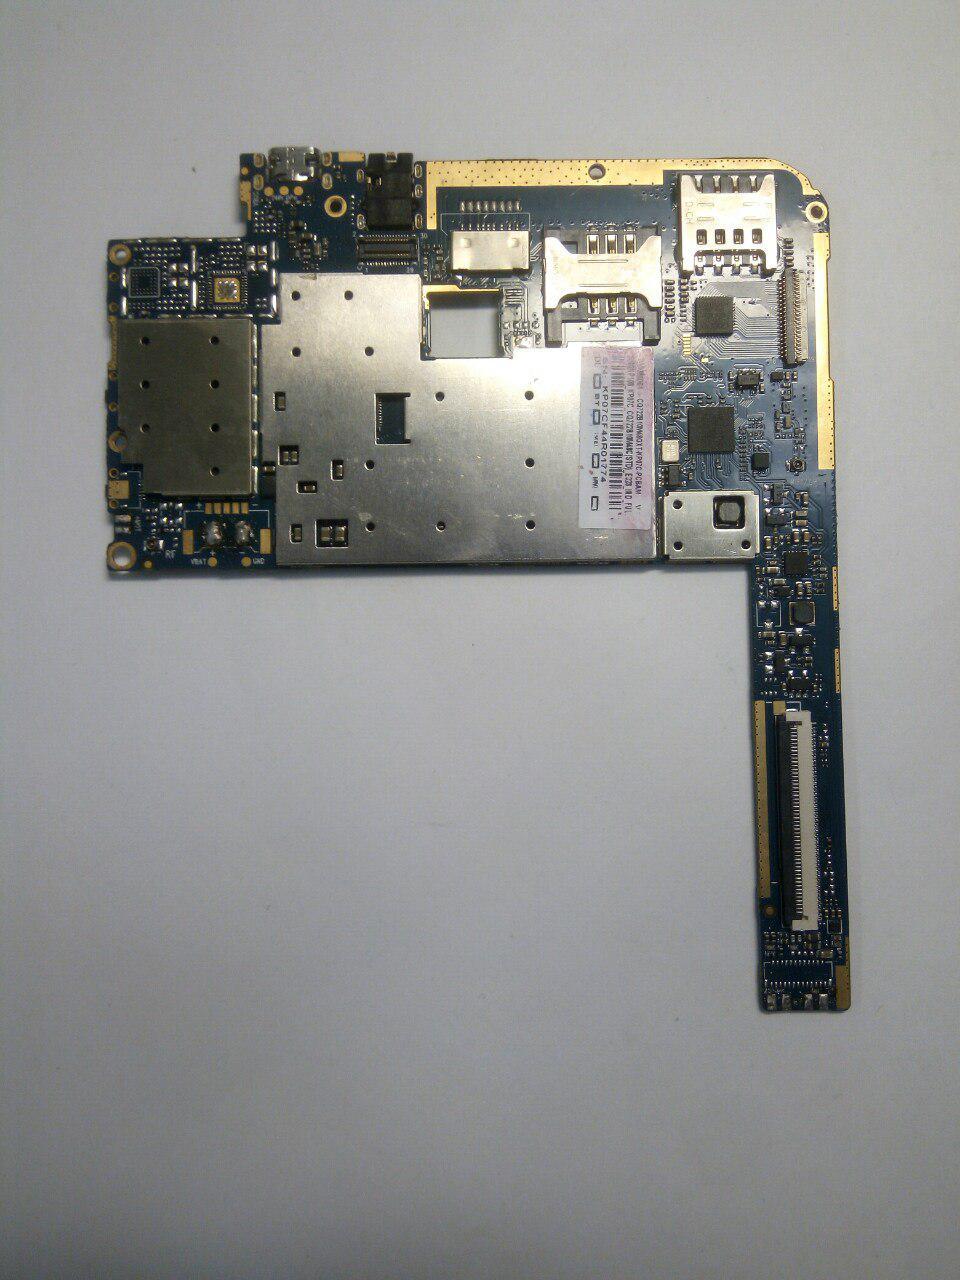 Материнская плата Oysters 7X 3G с разборки|Комплектующие для ремонта ноутбуков| | АлиЭкспресс